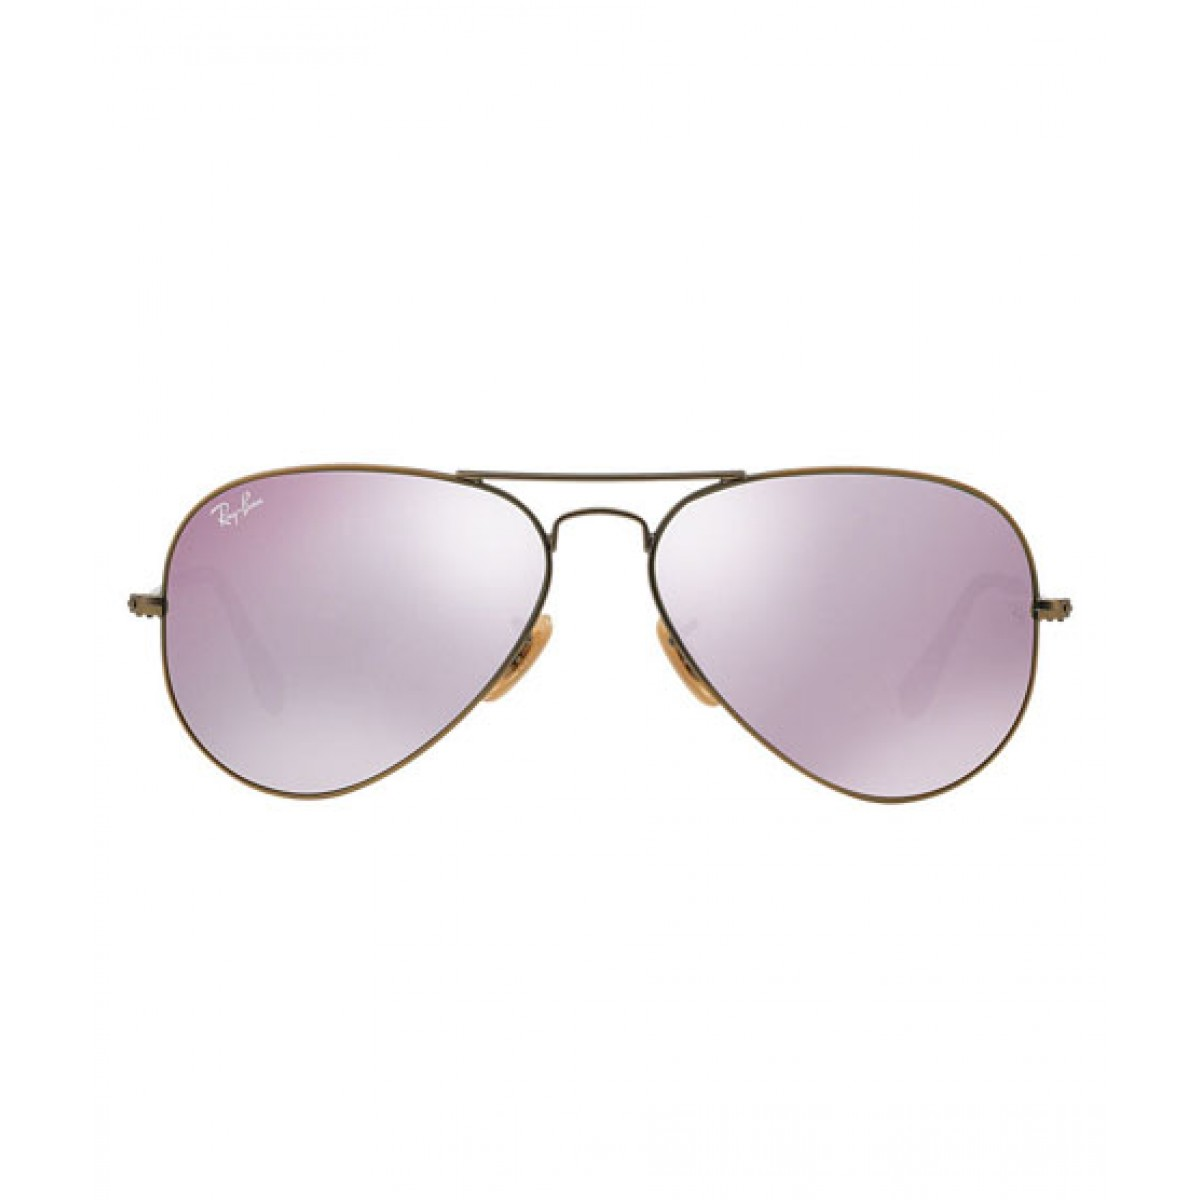 RayBan Original Aviator Non-Polarized Sunglasses RB3025 58